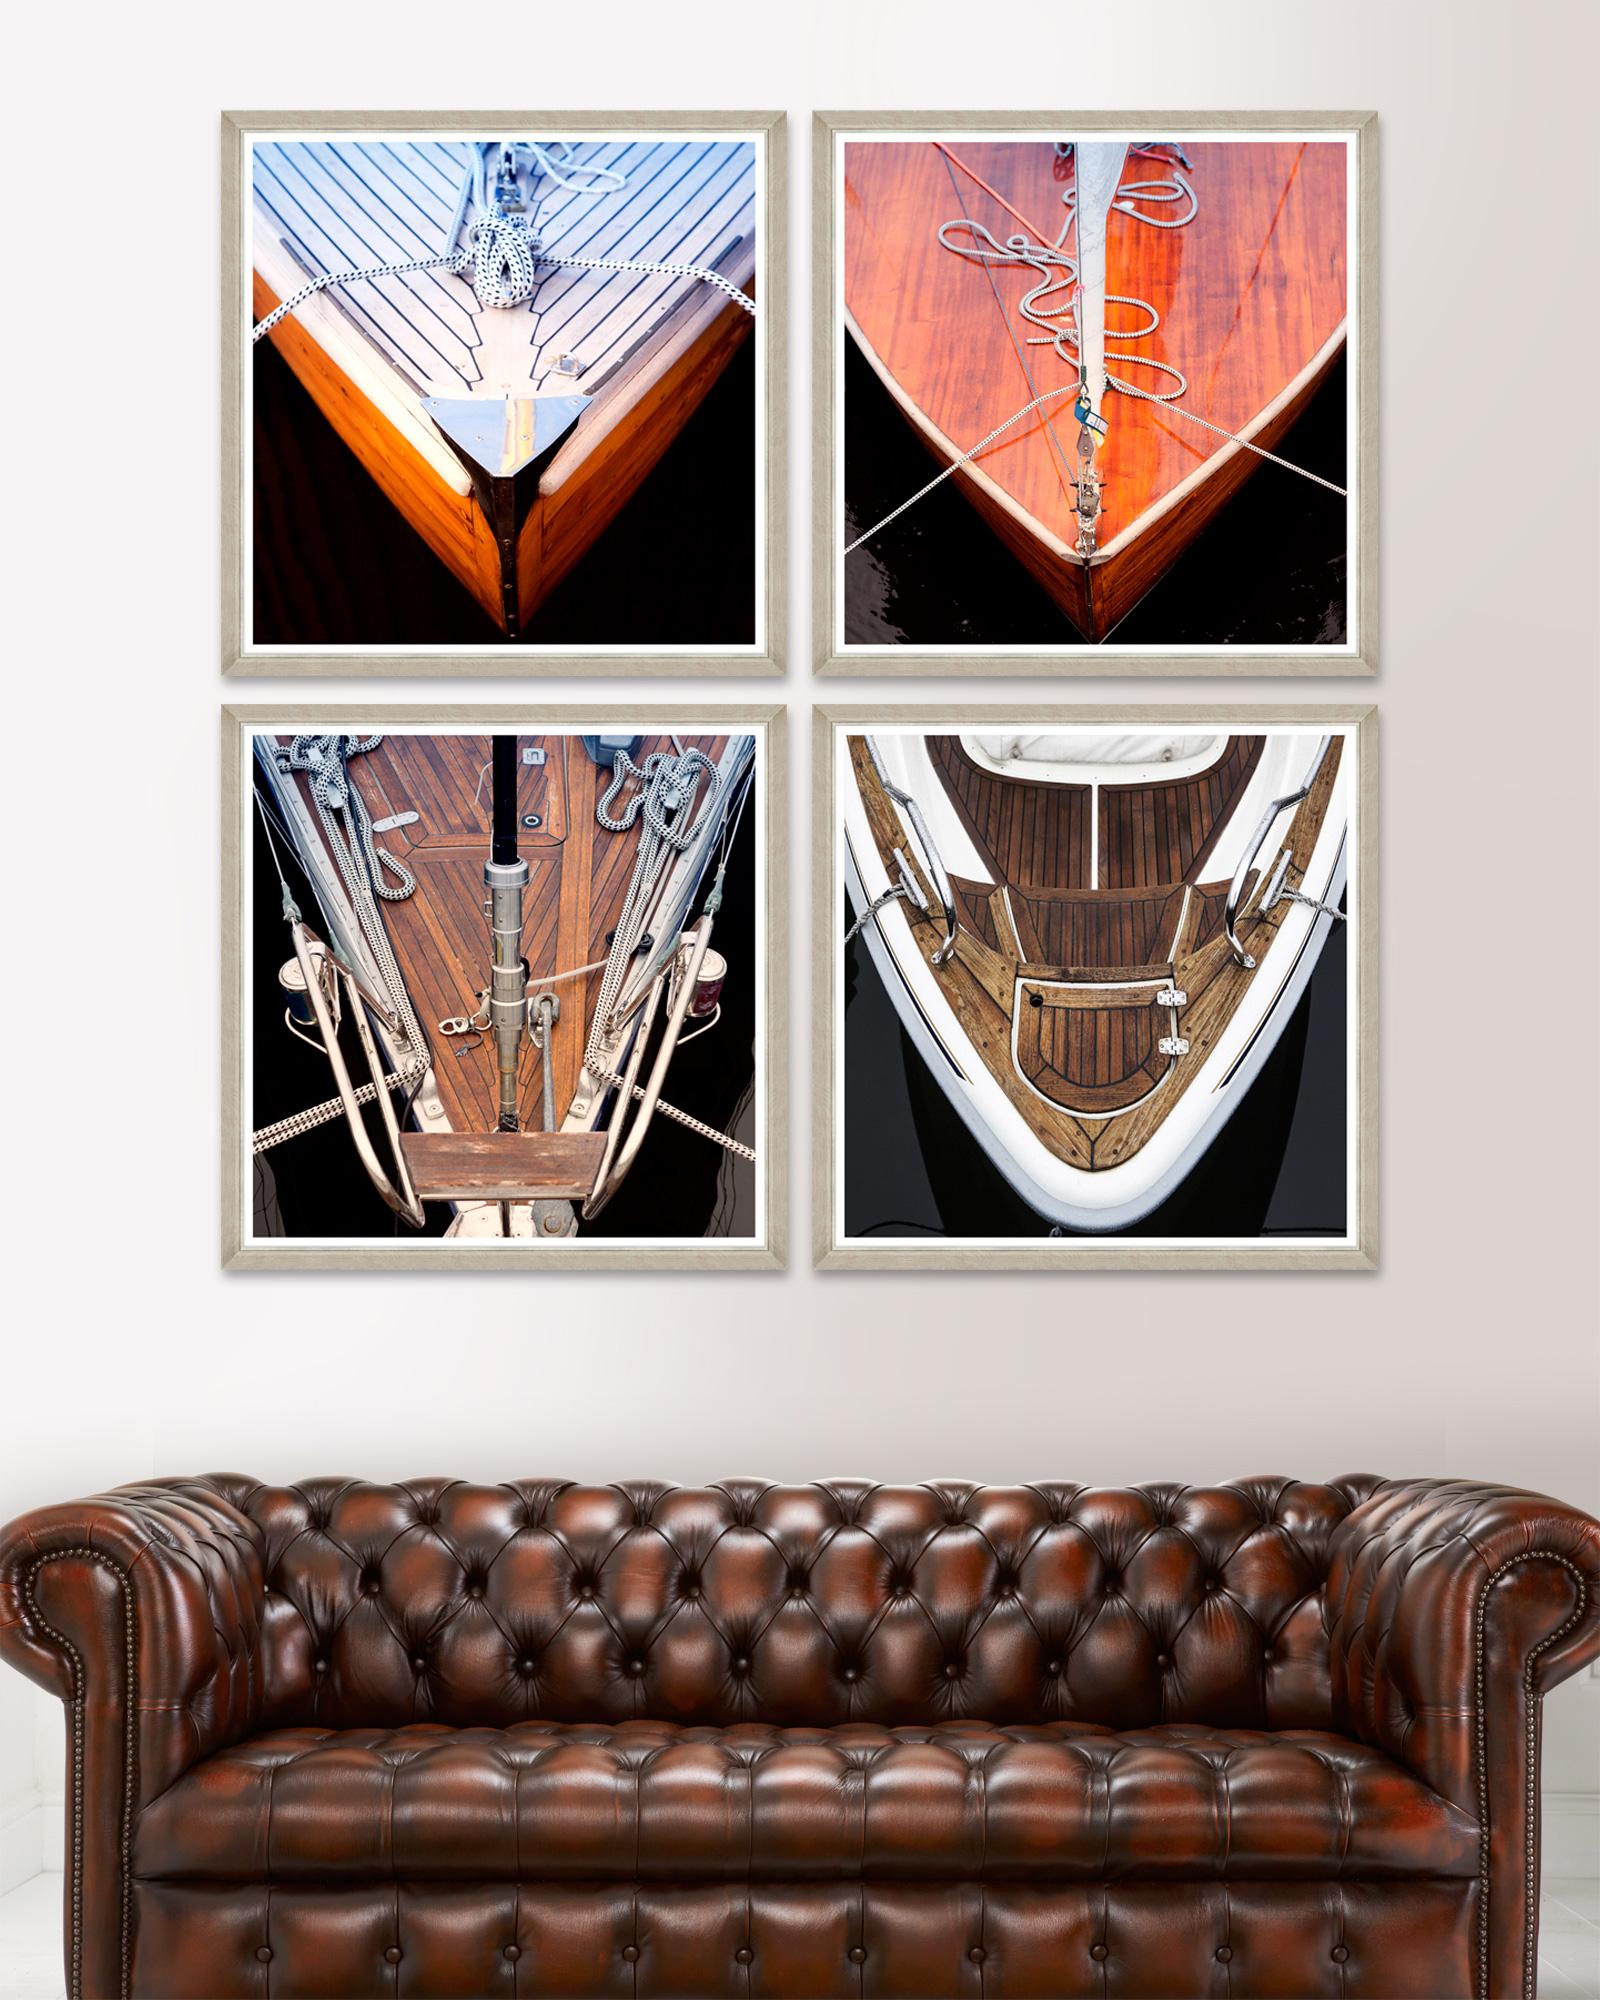 Tablou 4 piese Framed Art Wood Boat Fronts imagine